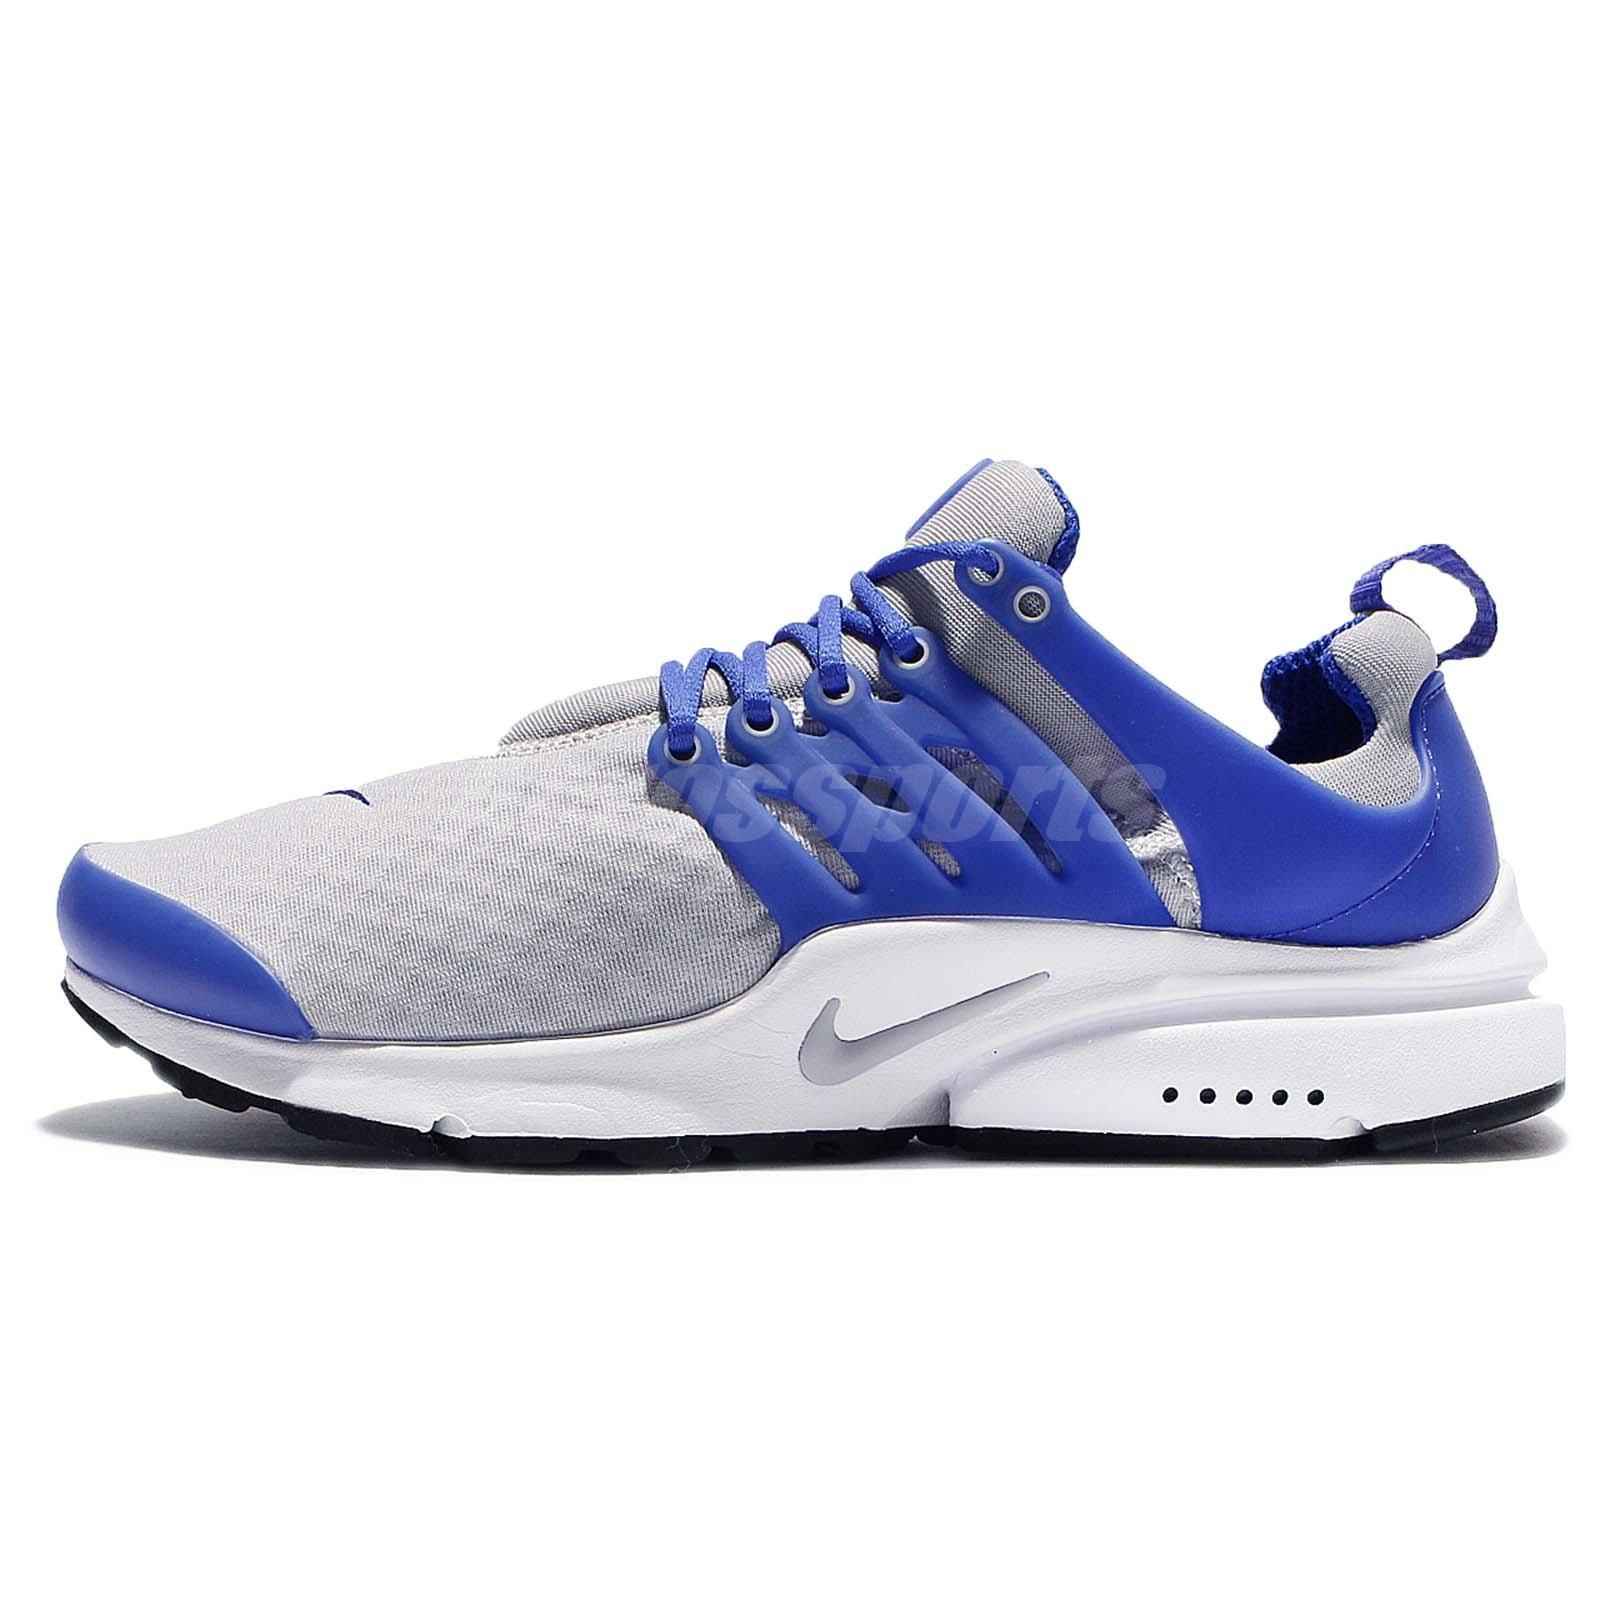 Nike Air Presto Essential Blue White Men Running Shoes Sneakers ...